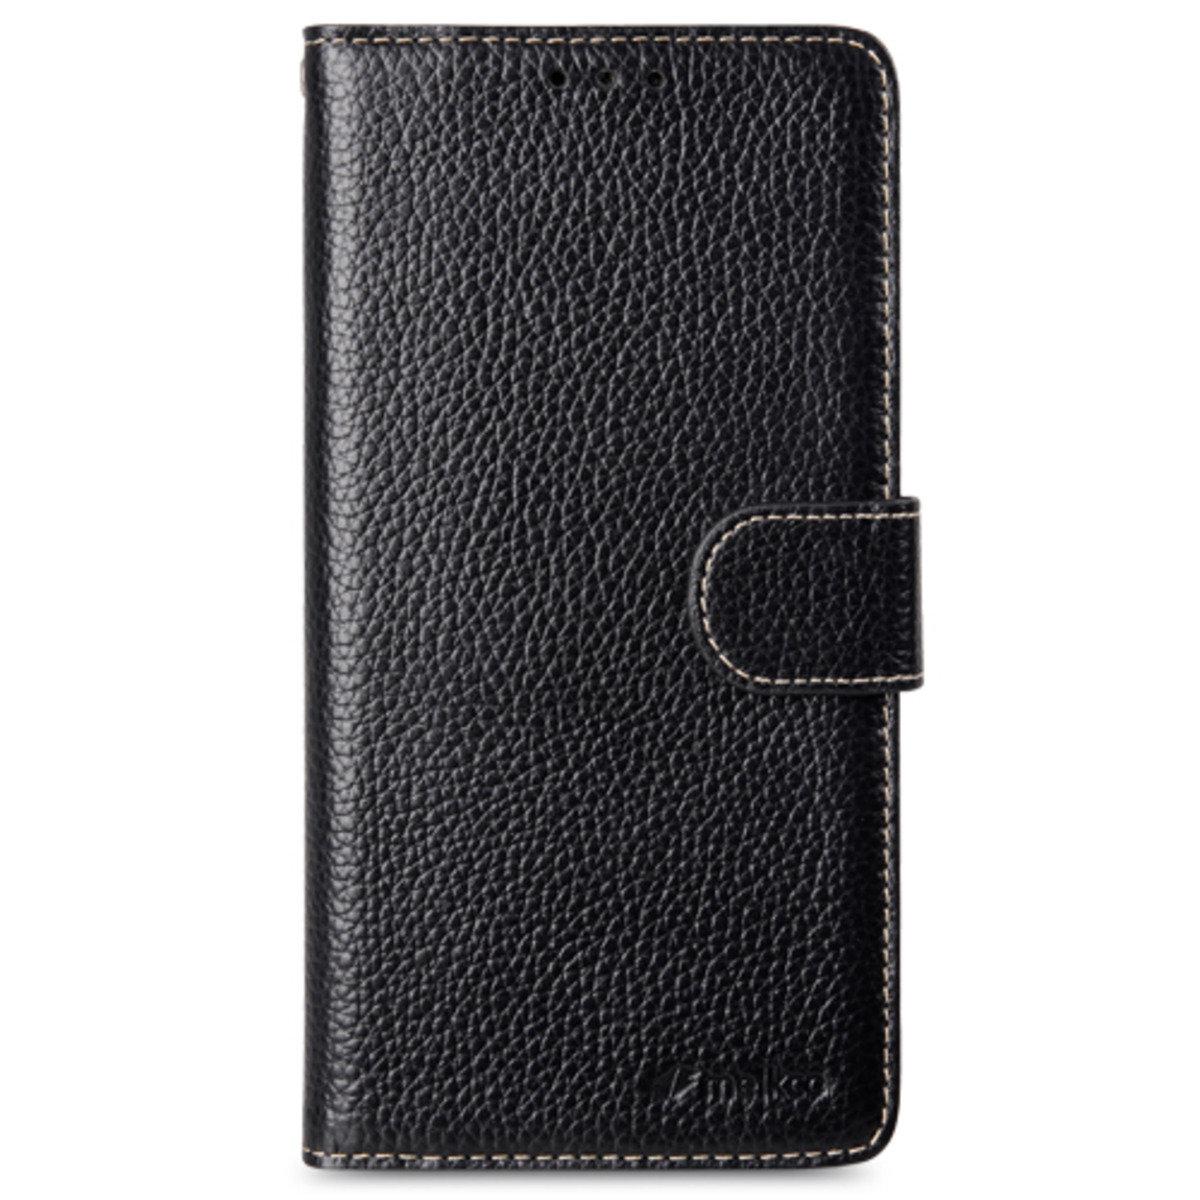 Samsung Galaxy S6 Edge Plus Wallet Book Type 高級真皮革手機套 - 黑色荔枝紋